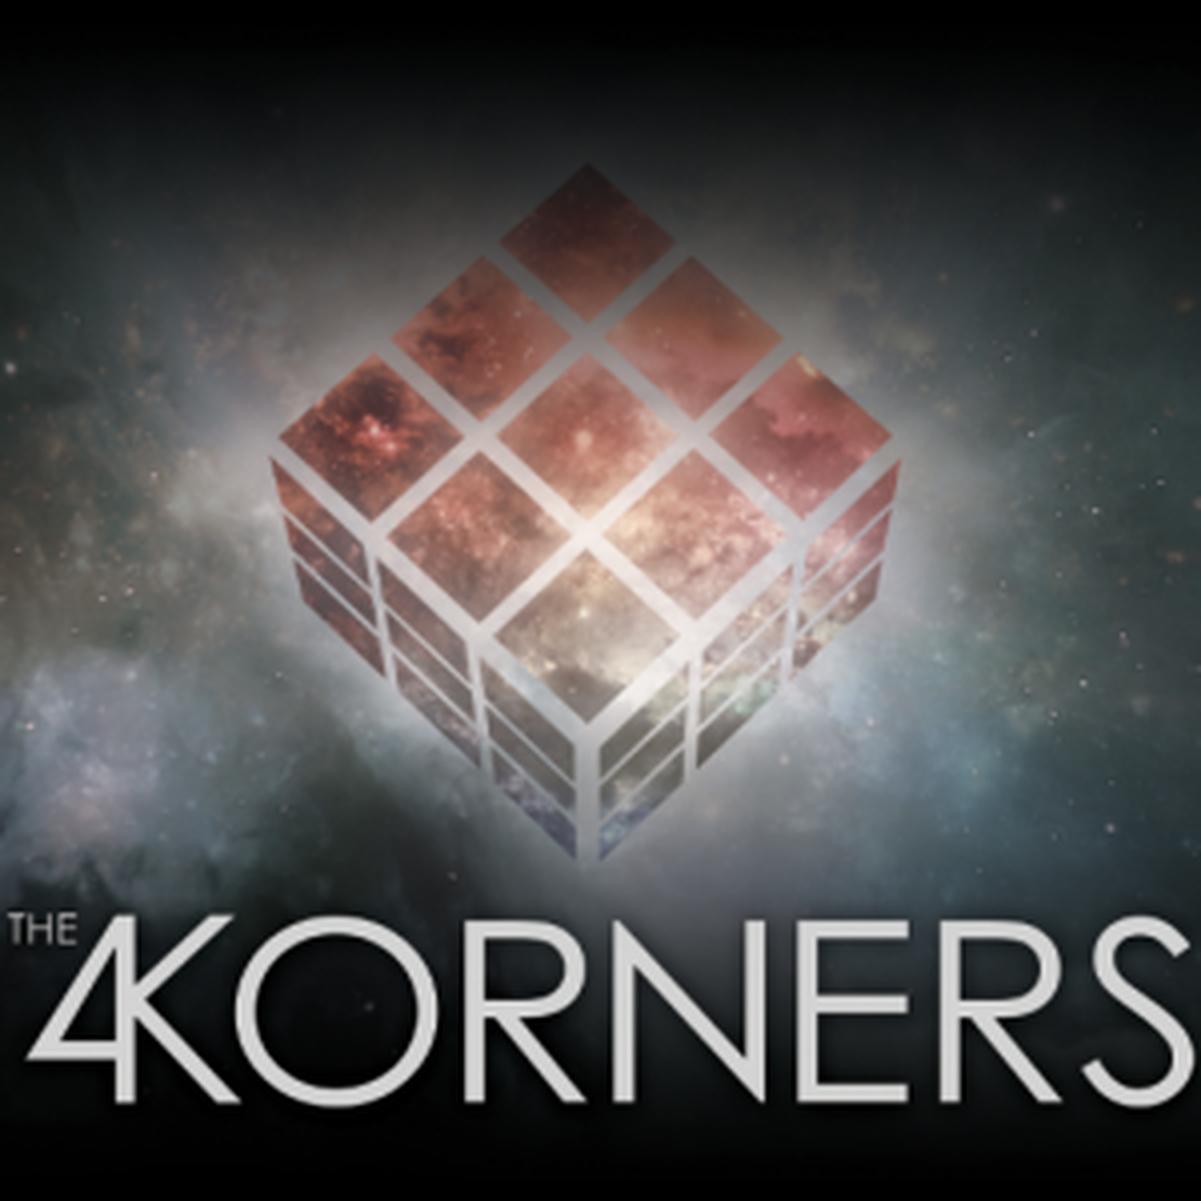 The 4 Korners wiki, The 4 Korners review, The 4 Korners history, The 4 Korners news